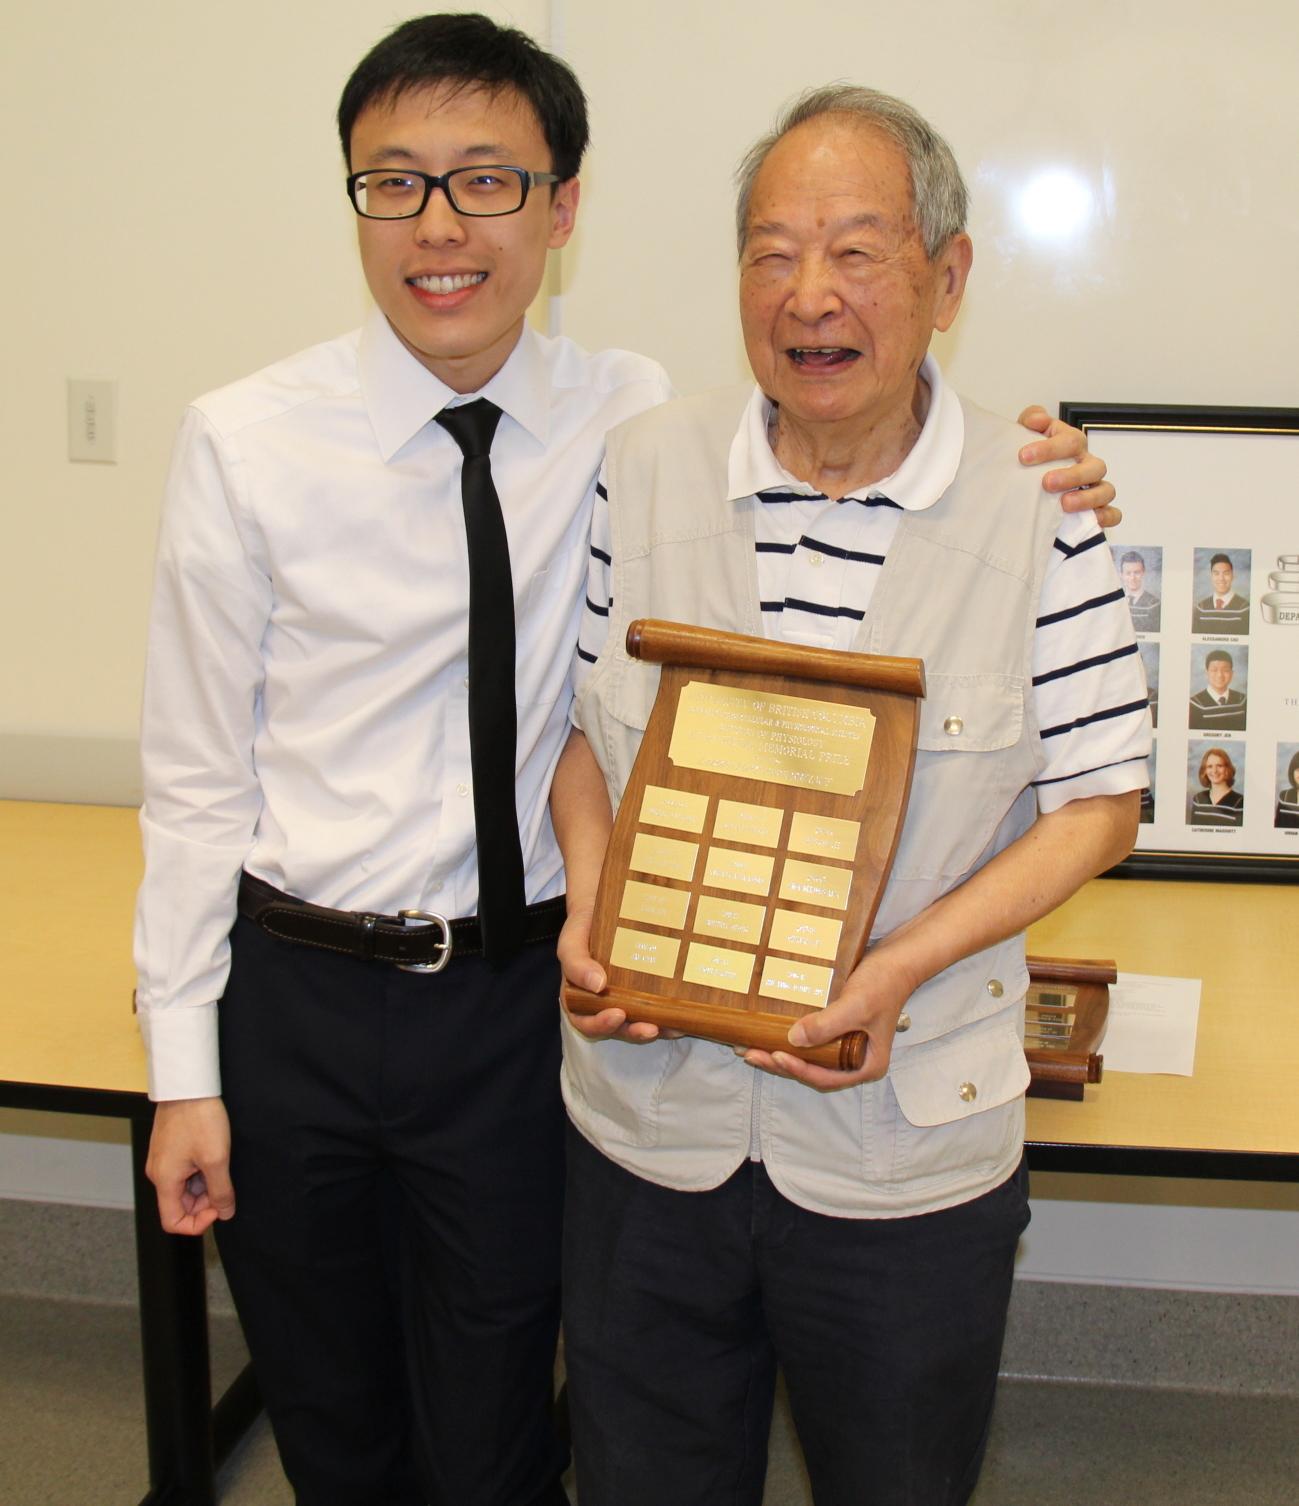 2017 CPS Graduate Award - 2